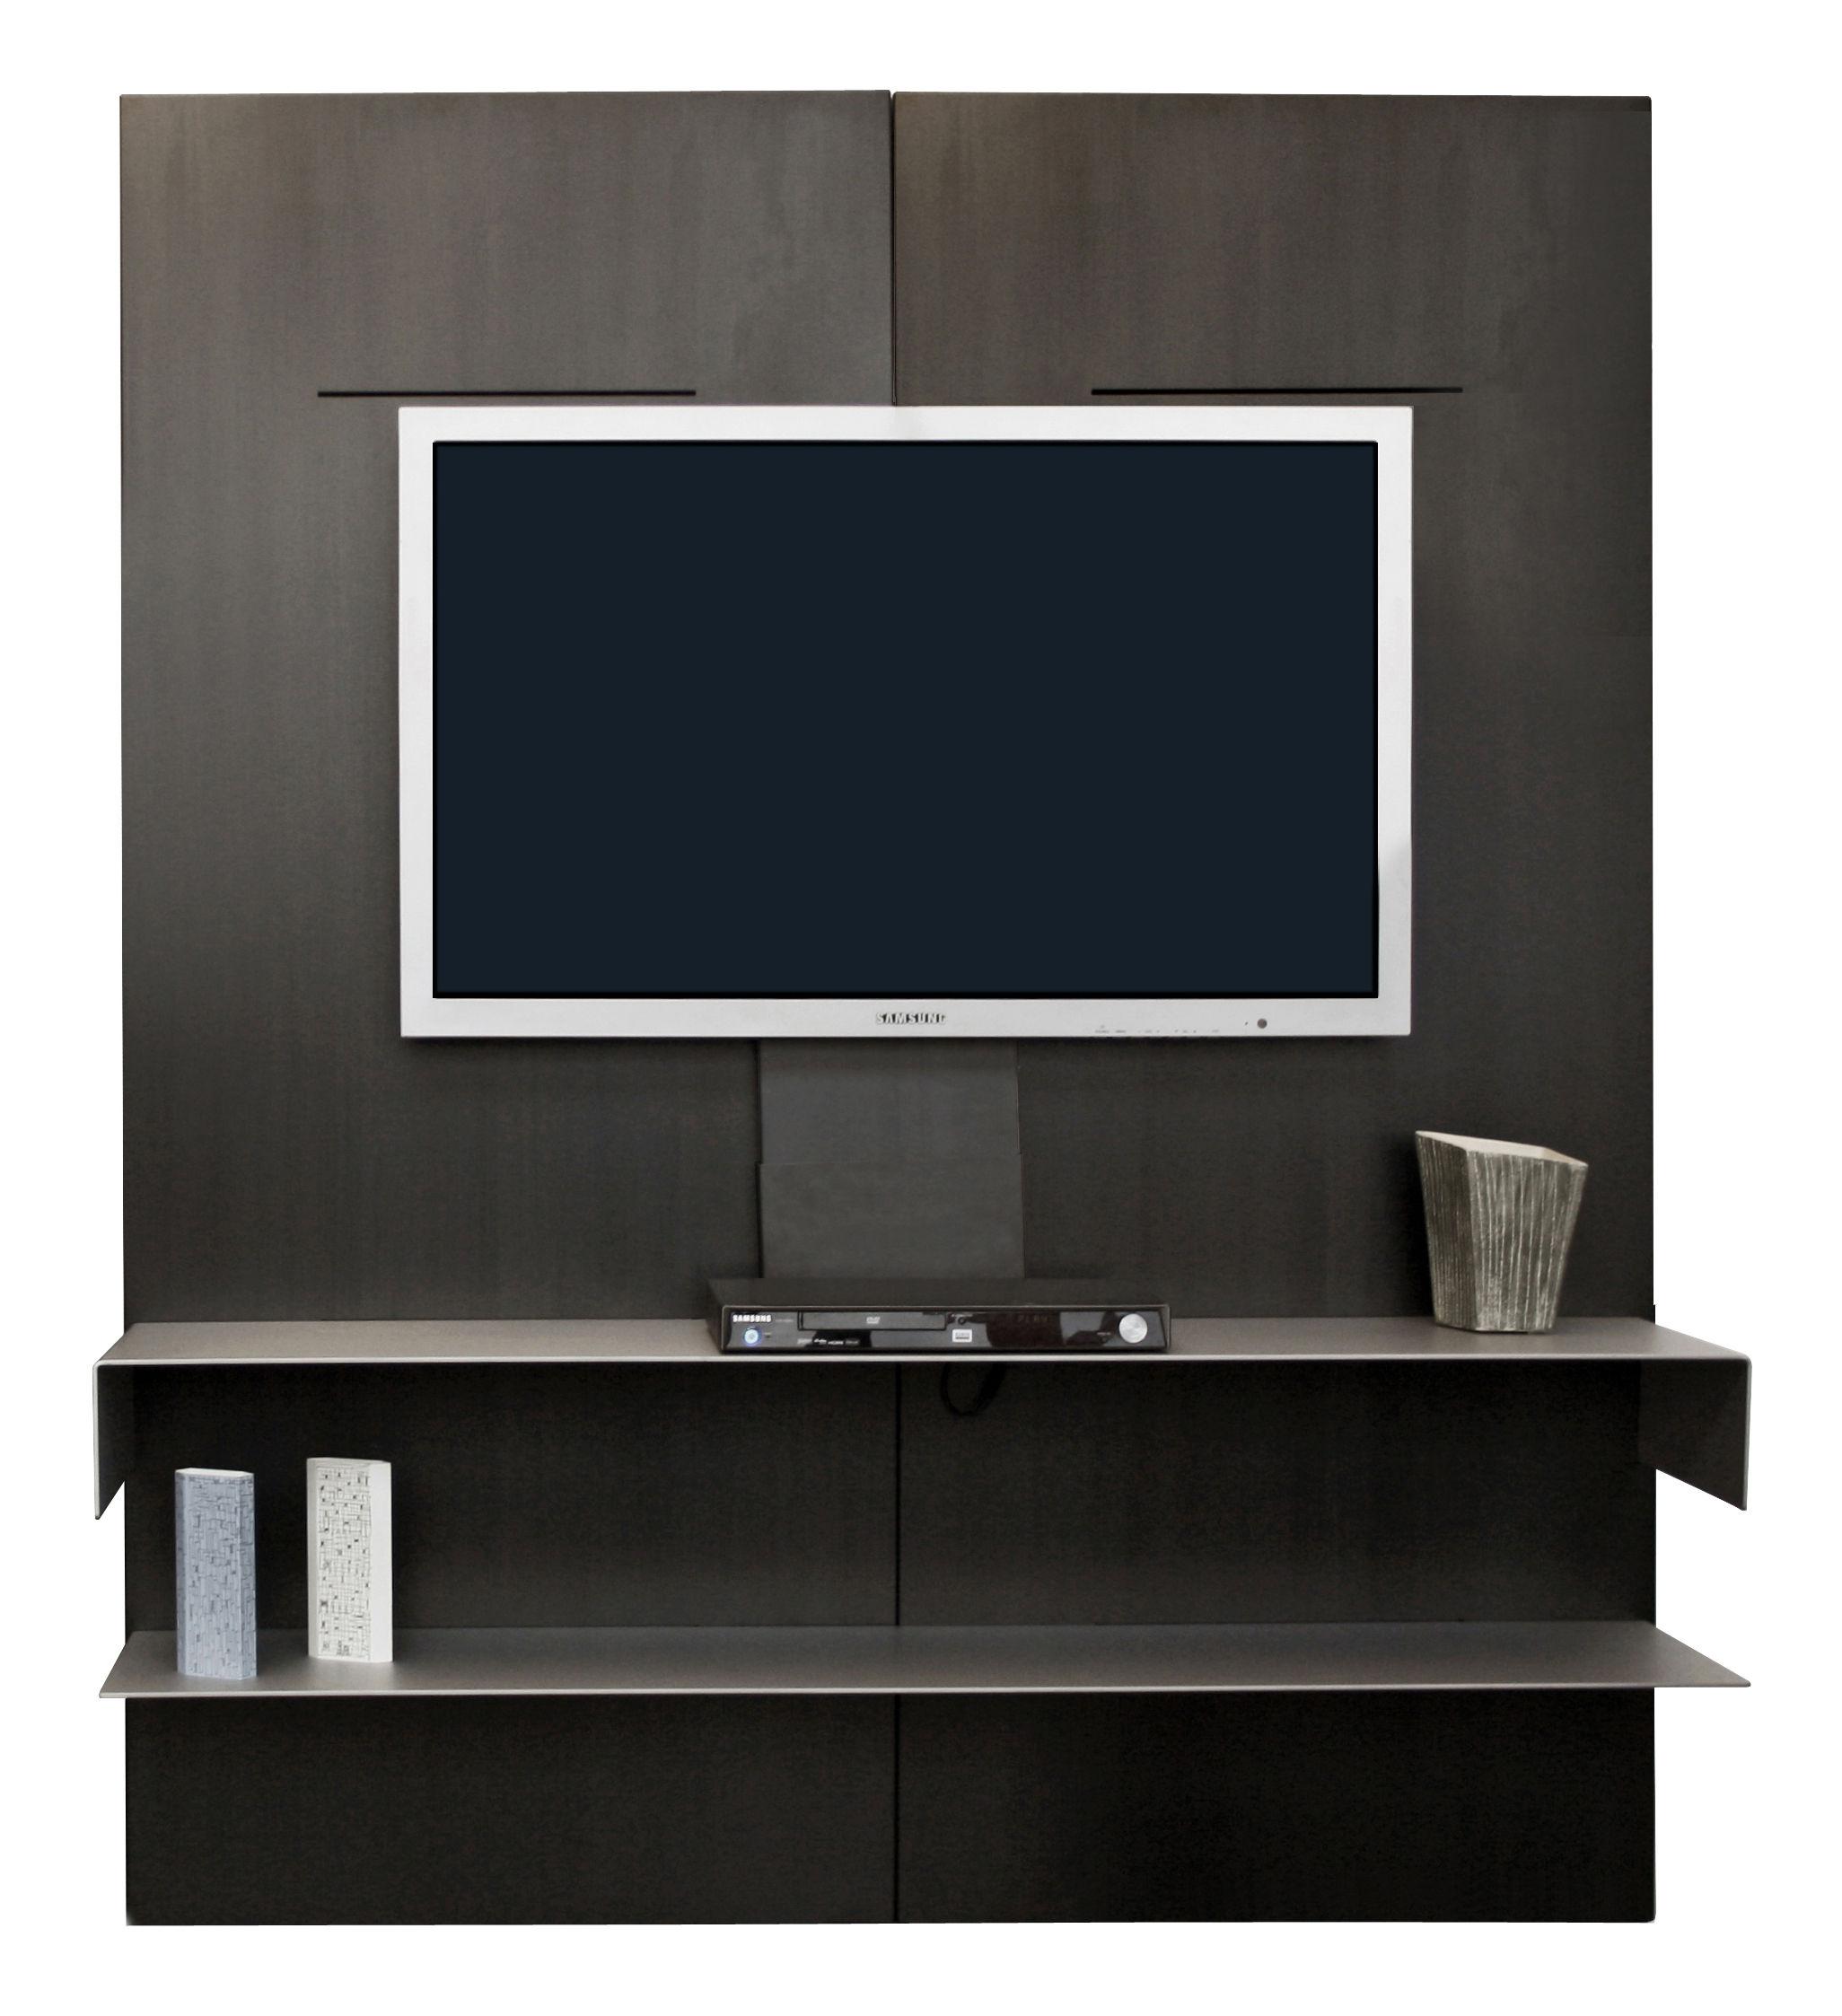 etag re iwall tv modulable acier zeus. Black Bedroom Furniture Sets. Home Design Ideas